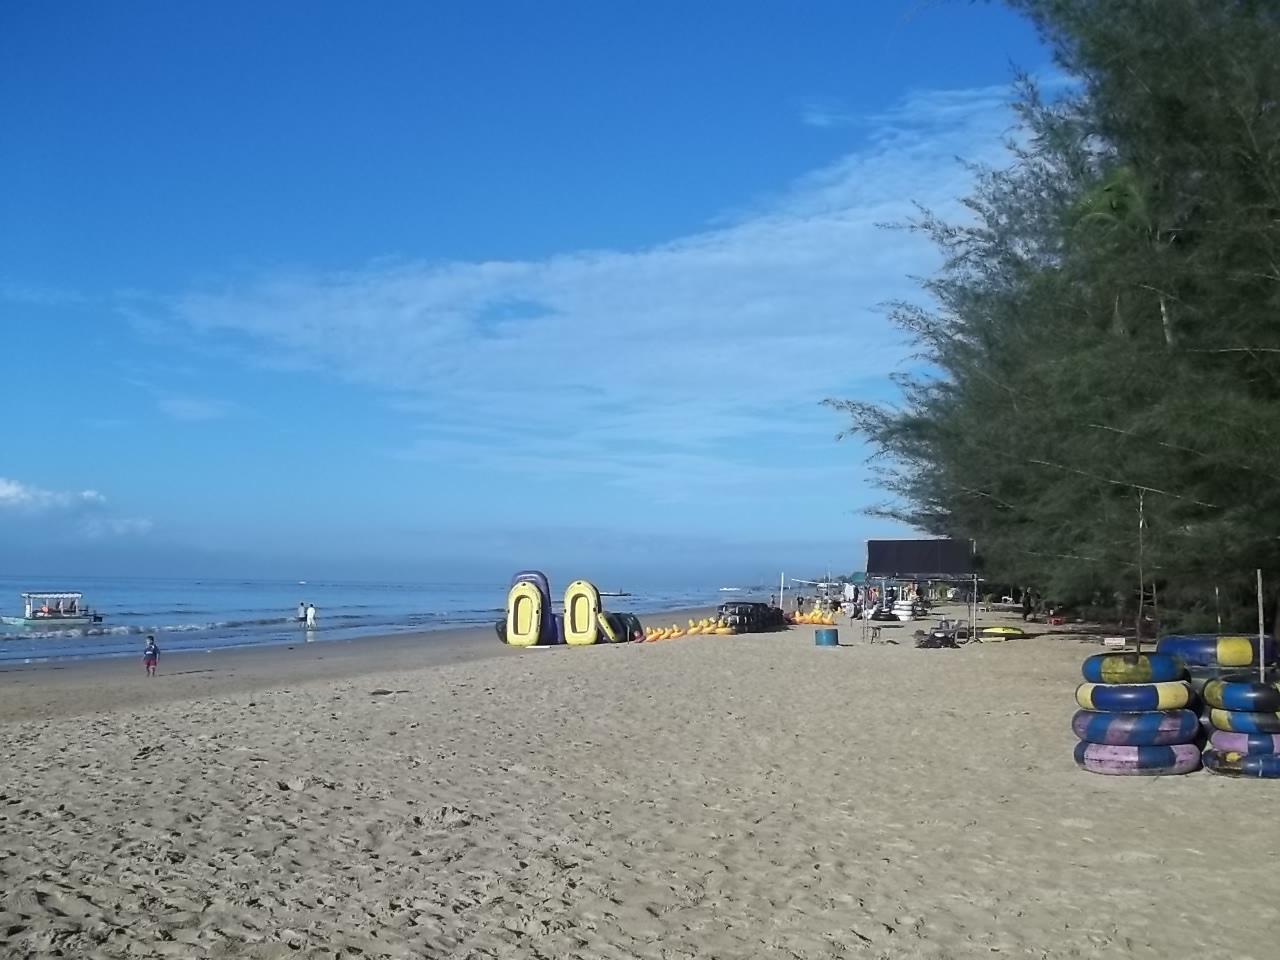 Minggu Beach East Kalimantan Archive Indonesia Tourism